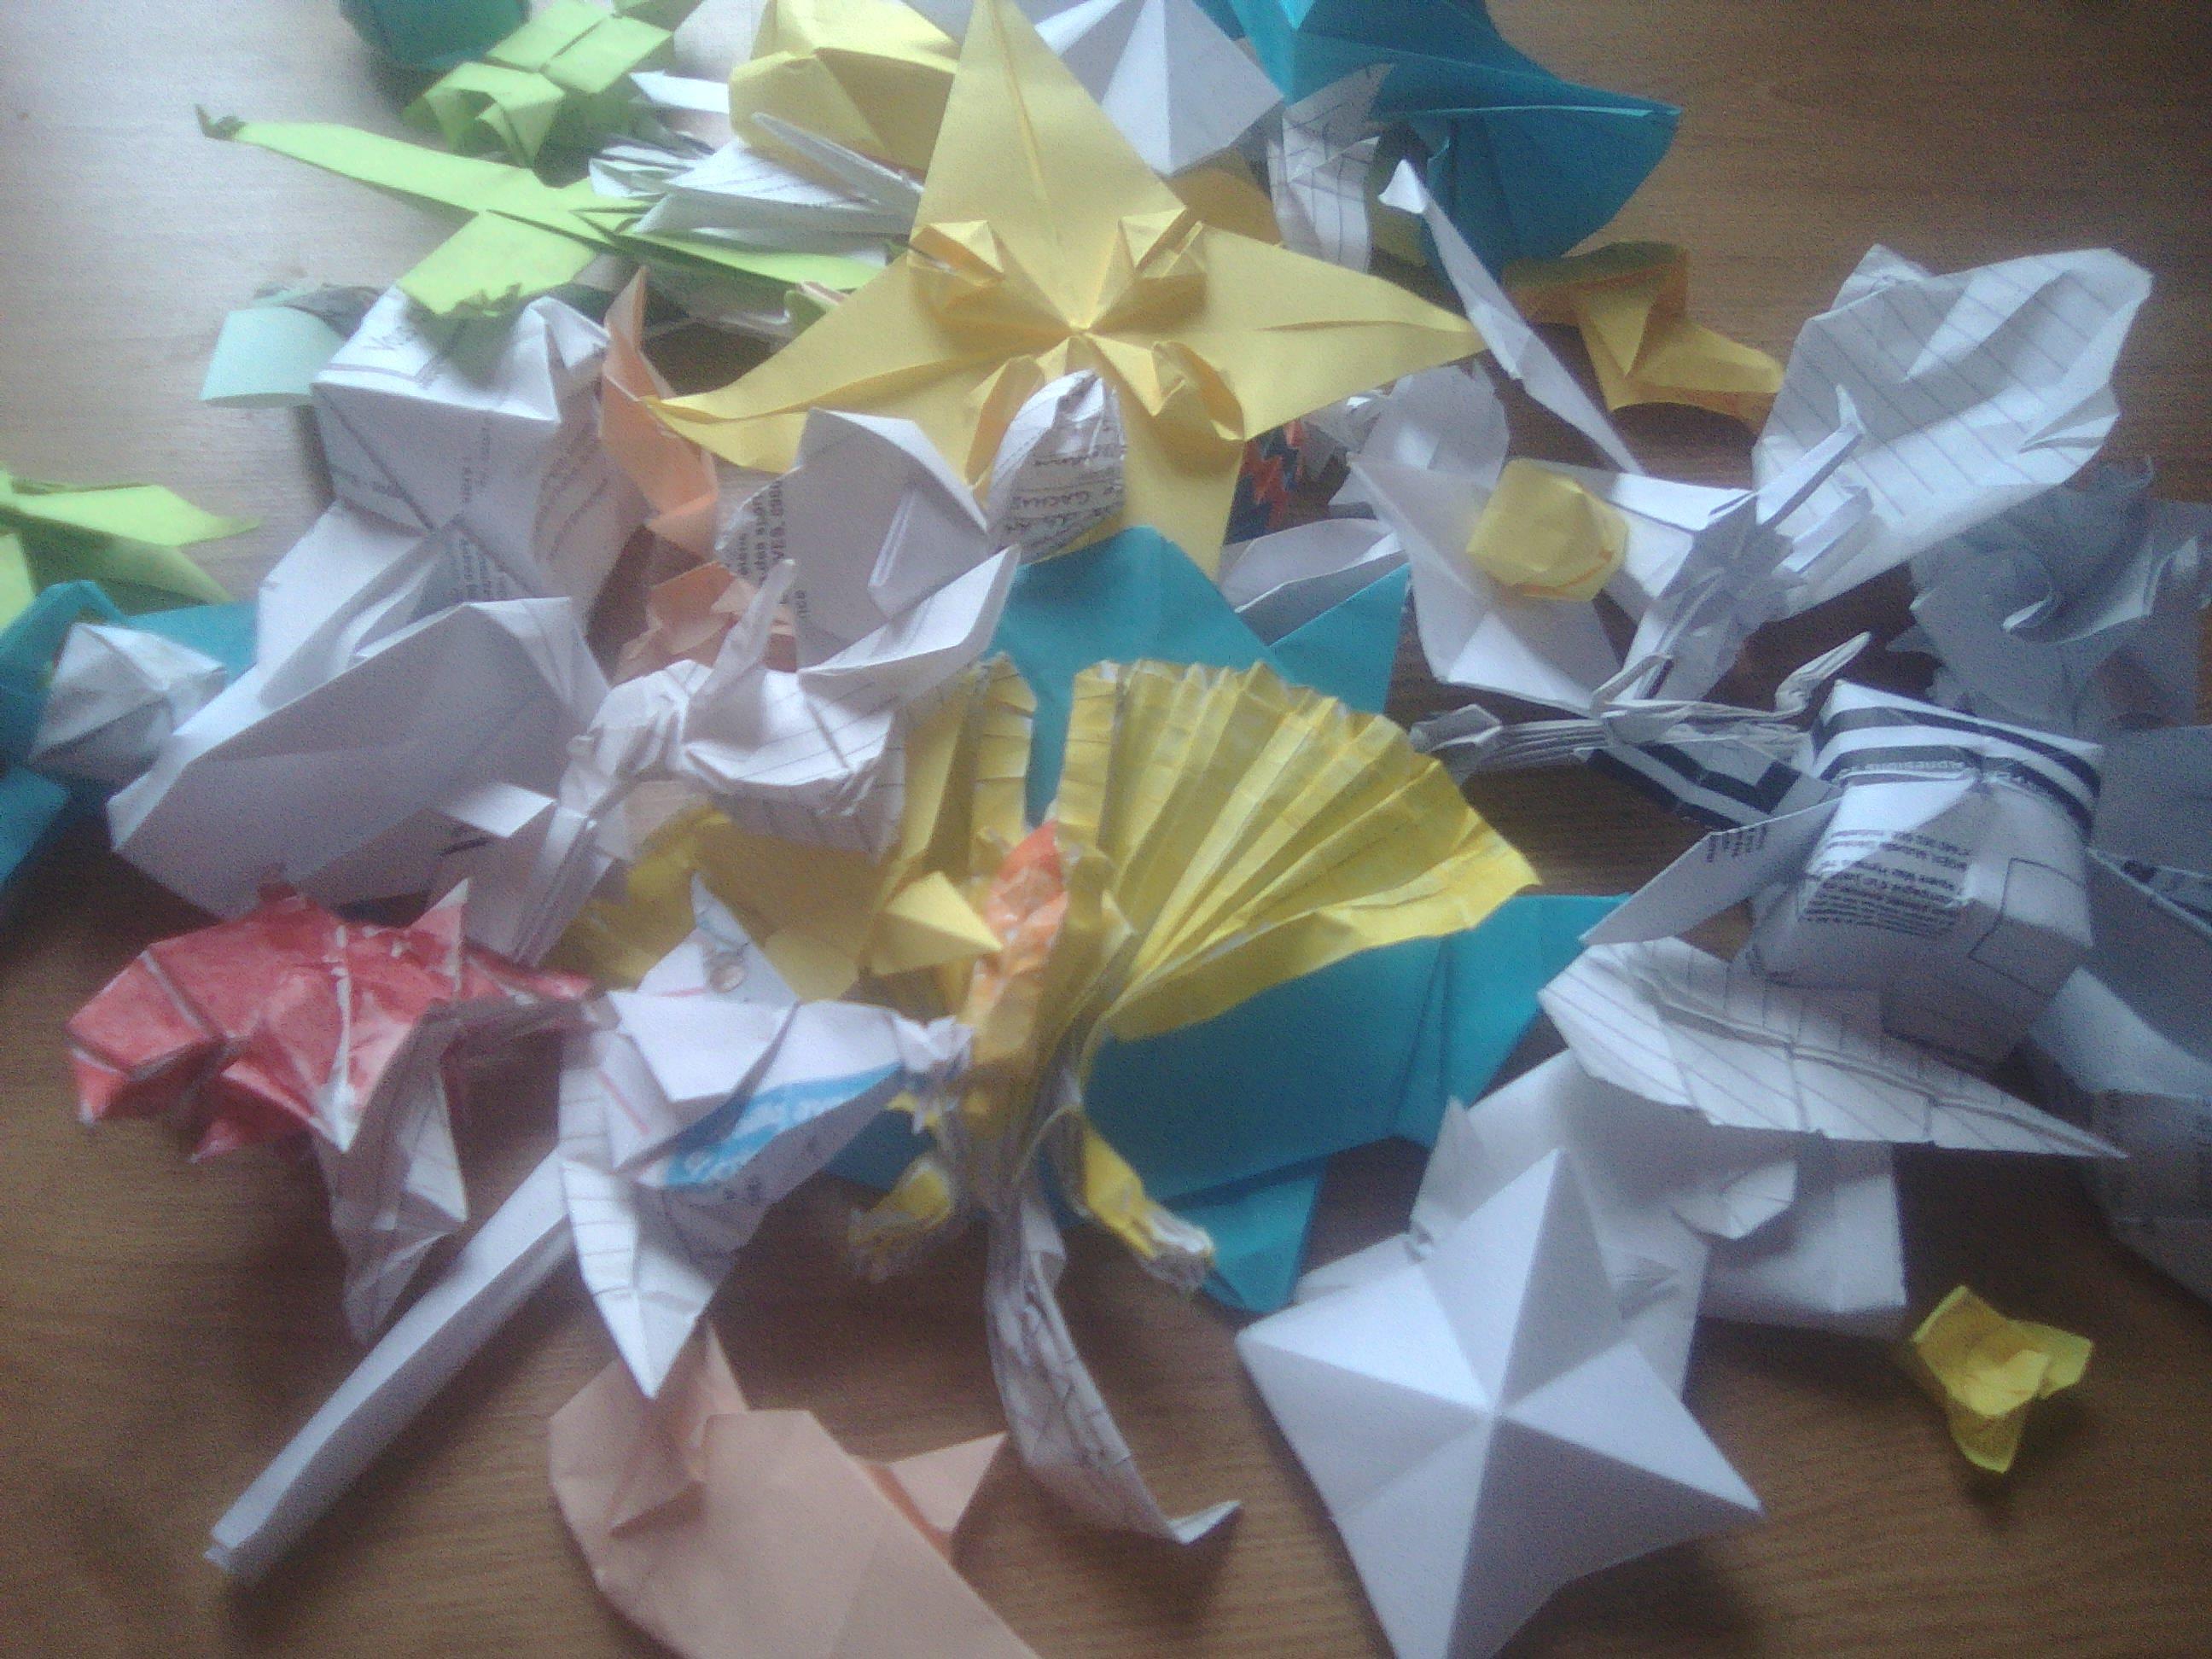 troc de troc origami sur demande image 1